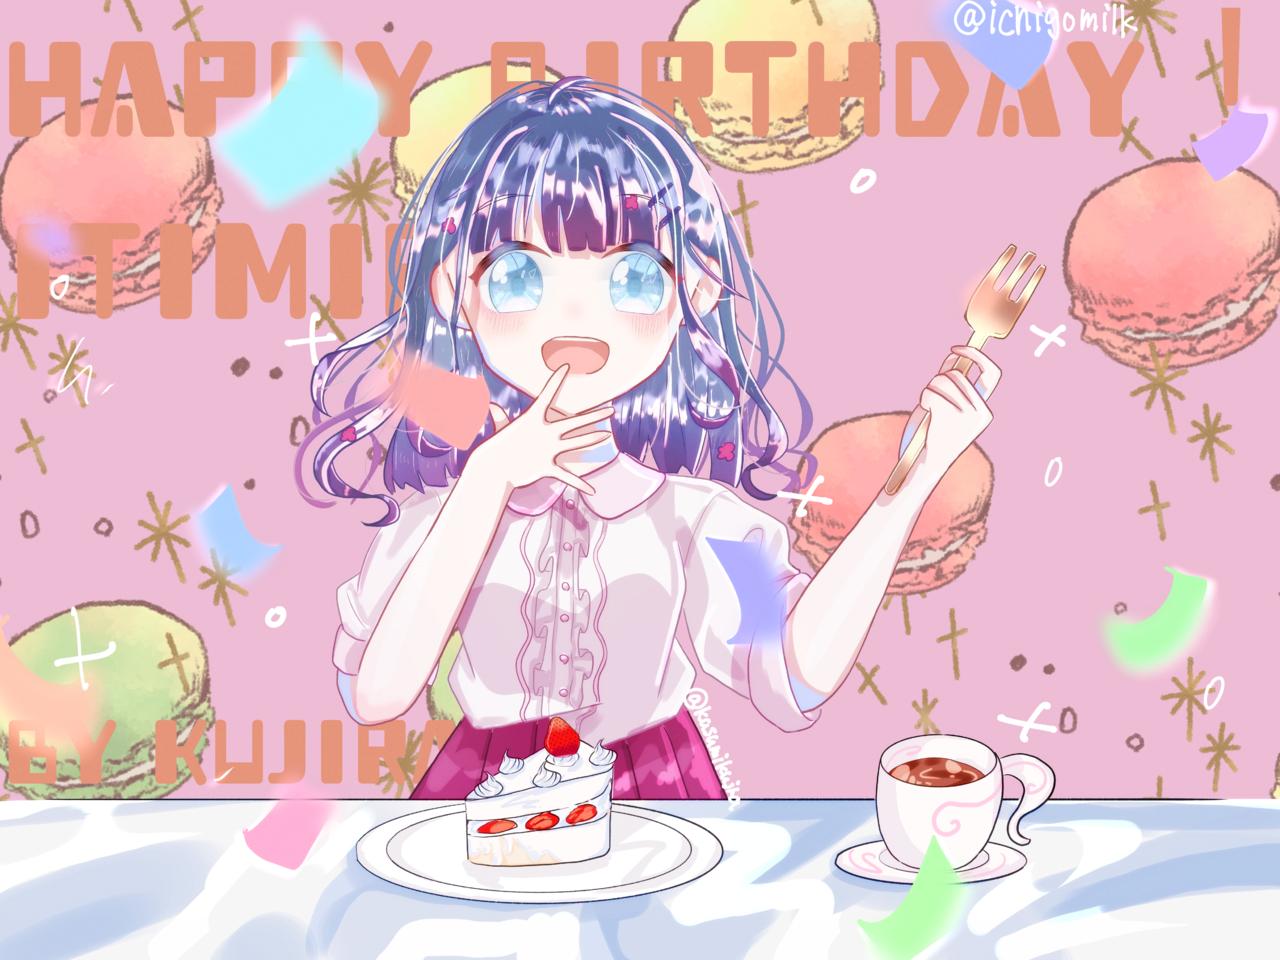 ITIMIRU   happy birthday!【イチミル】 Illust of 冬路くじら pink girl birthday medibangpaint illustration 苺アートボックス kawaii